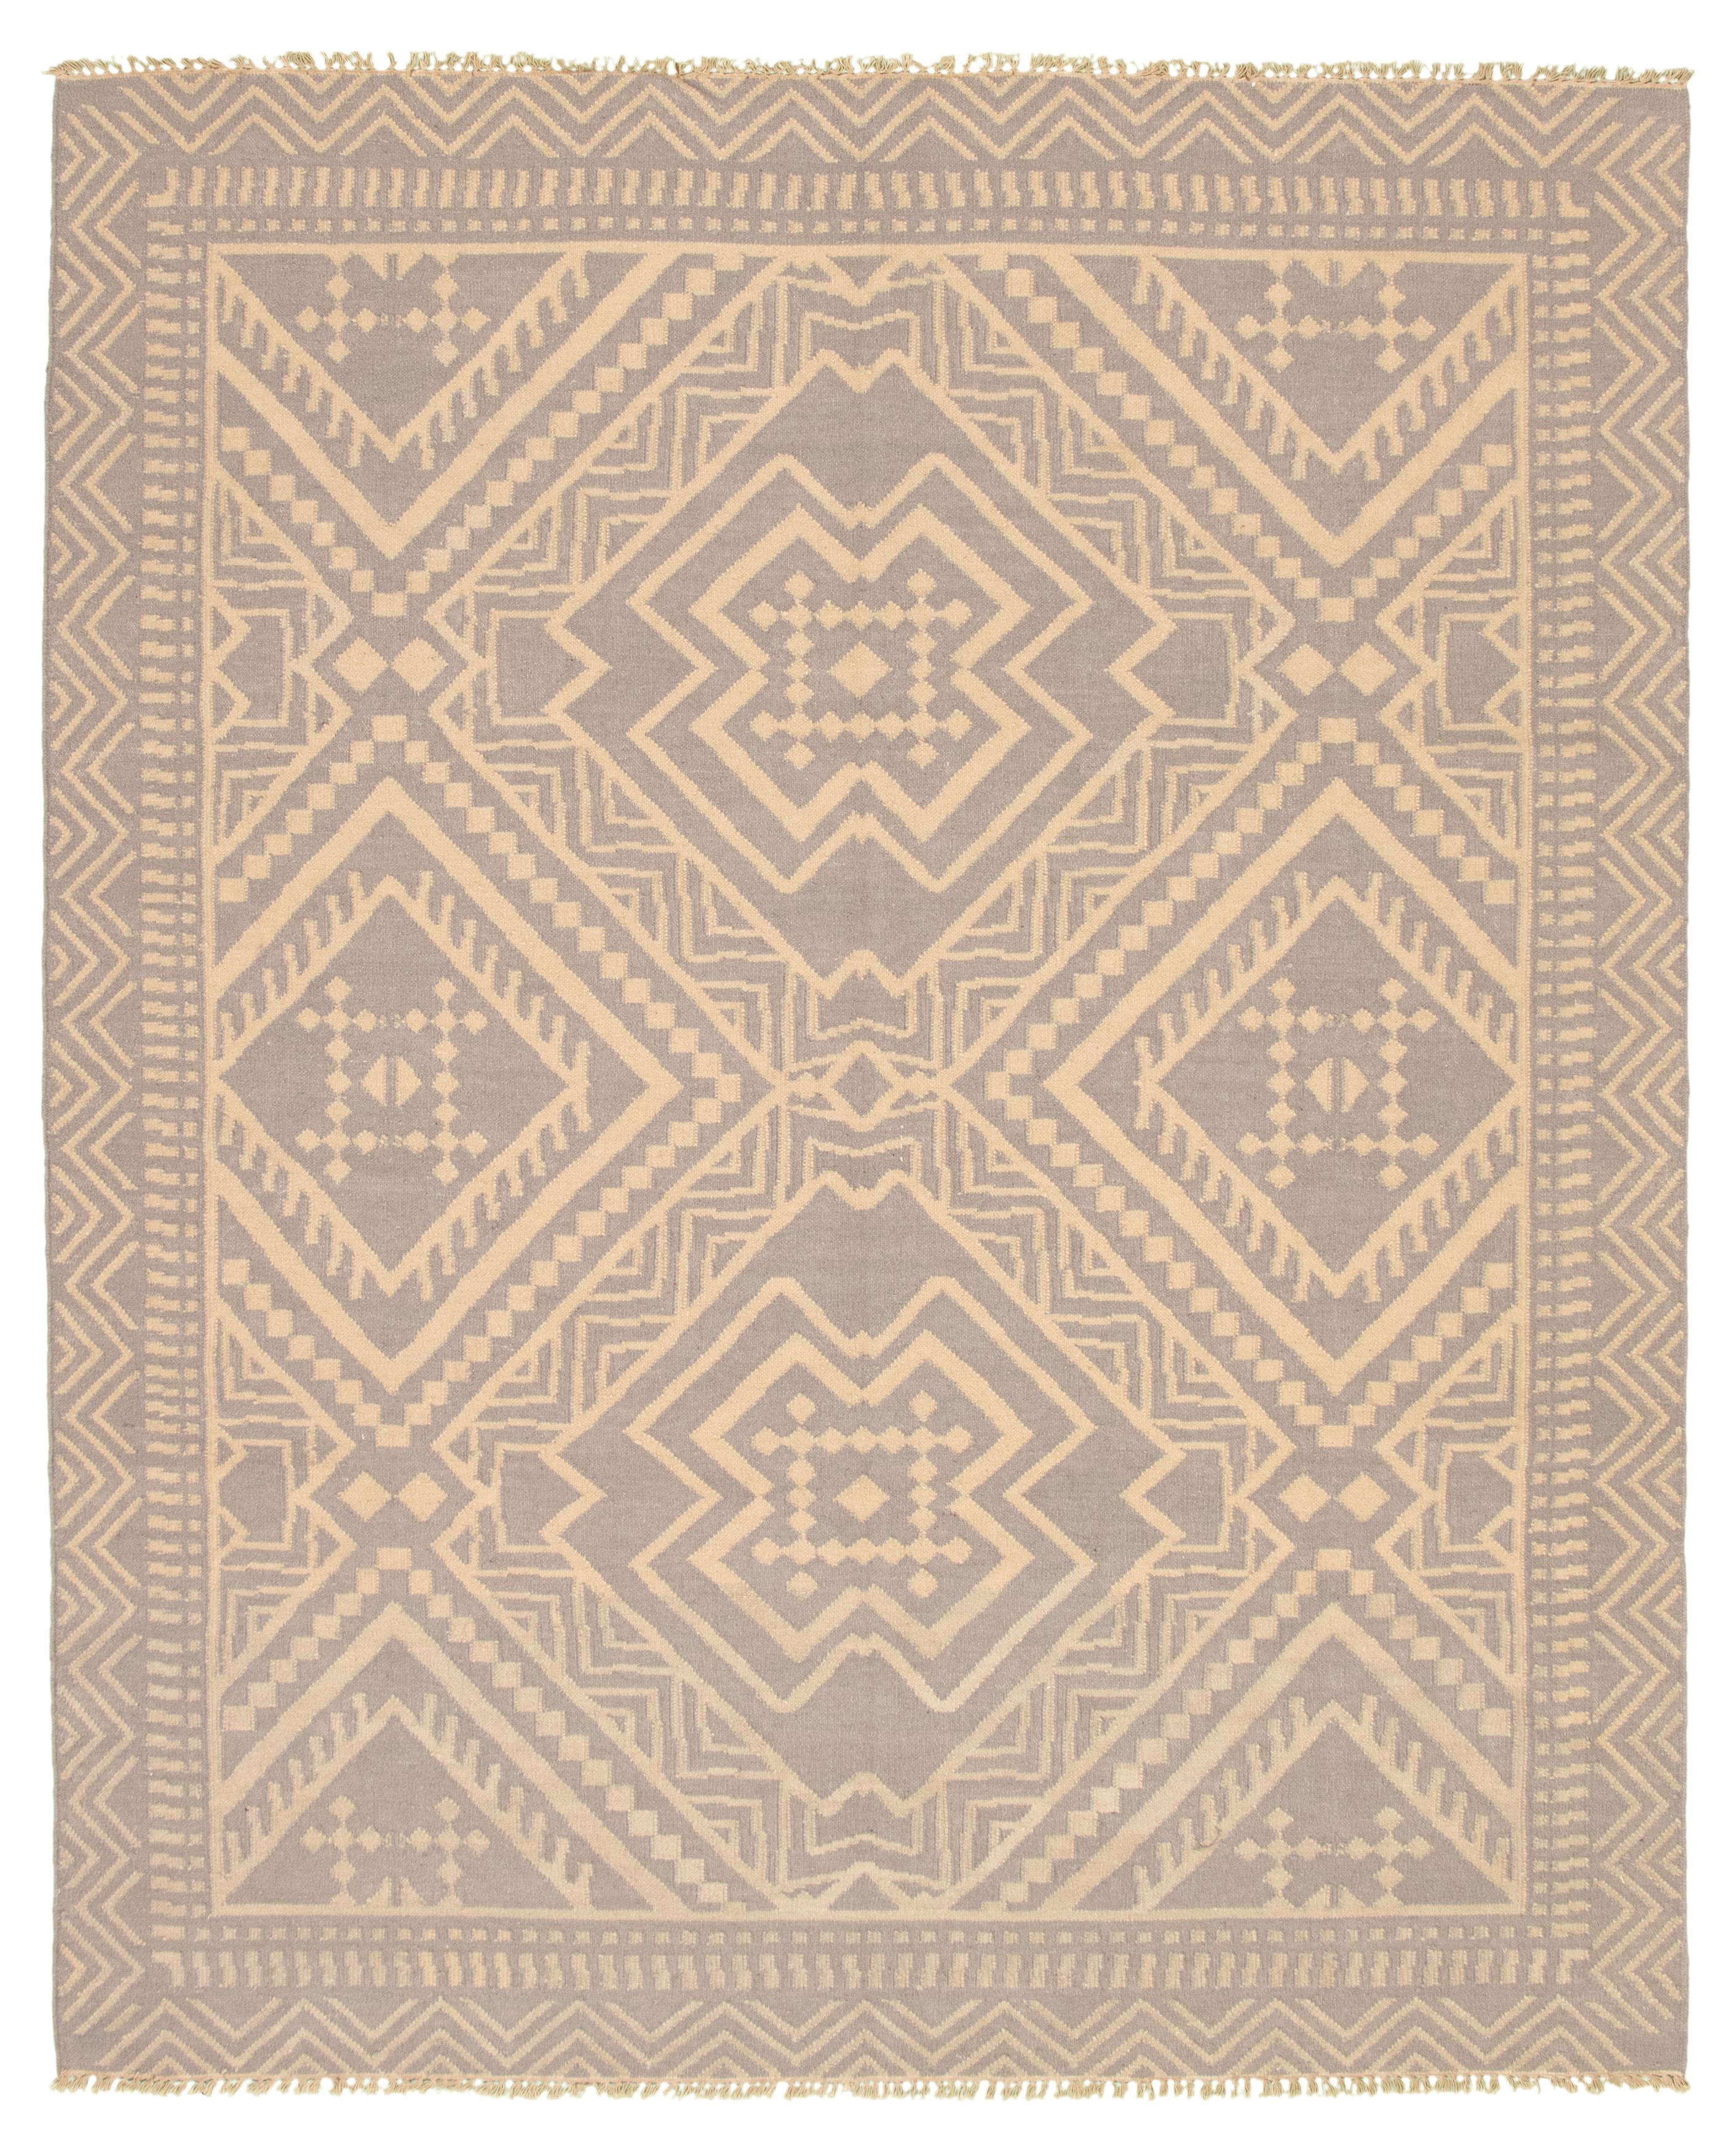 "Hand woven Pure & Organic Grey Wool Kilim 8'1"" x 9'11"" Size: 8'1"" x 9'11"""